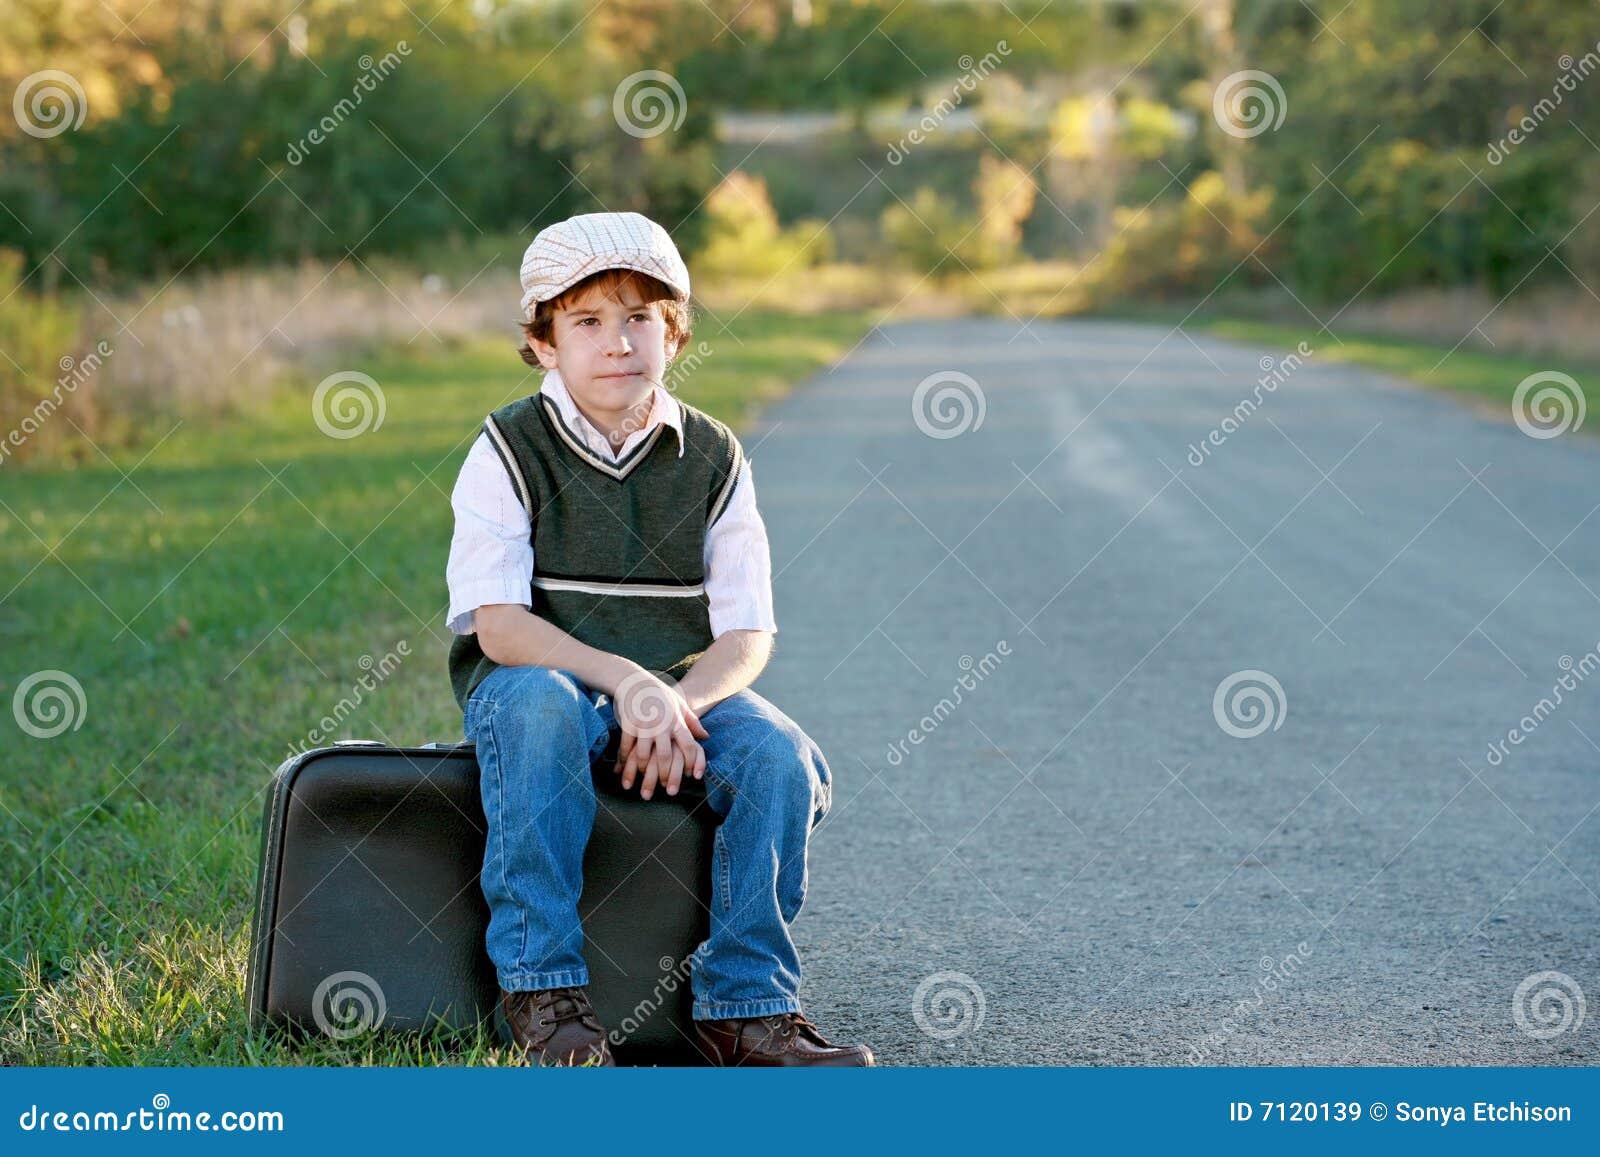 Little boy traveling in an airplane ~ Transportation ...  Little Boy Traveling